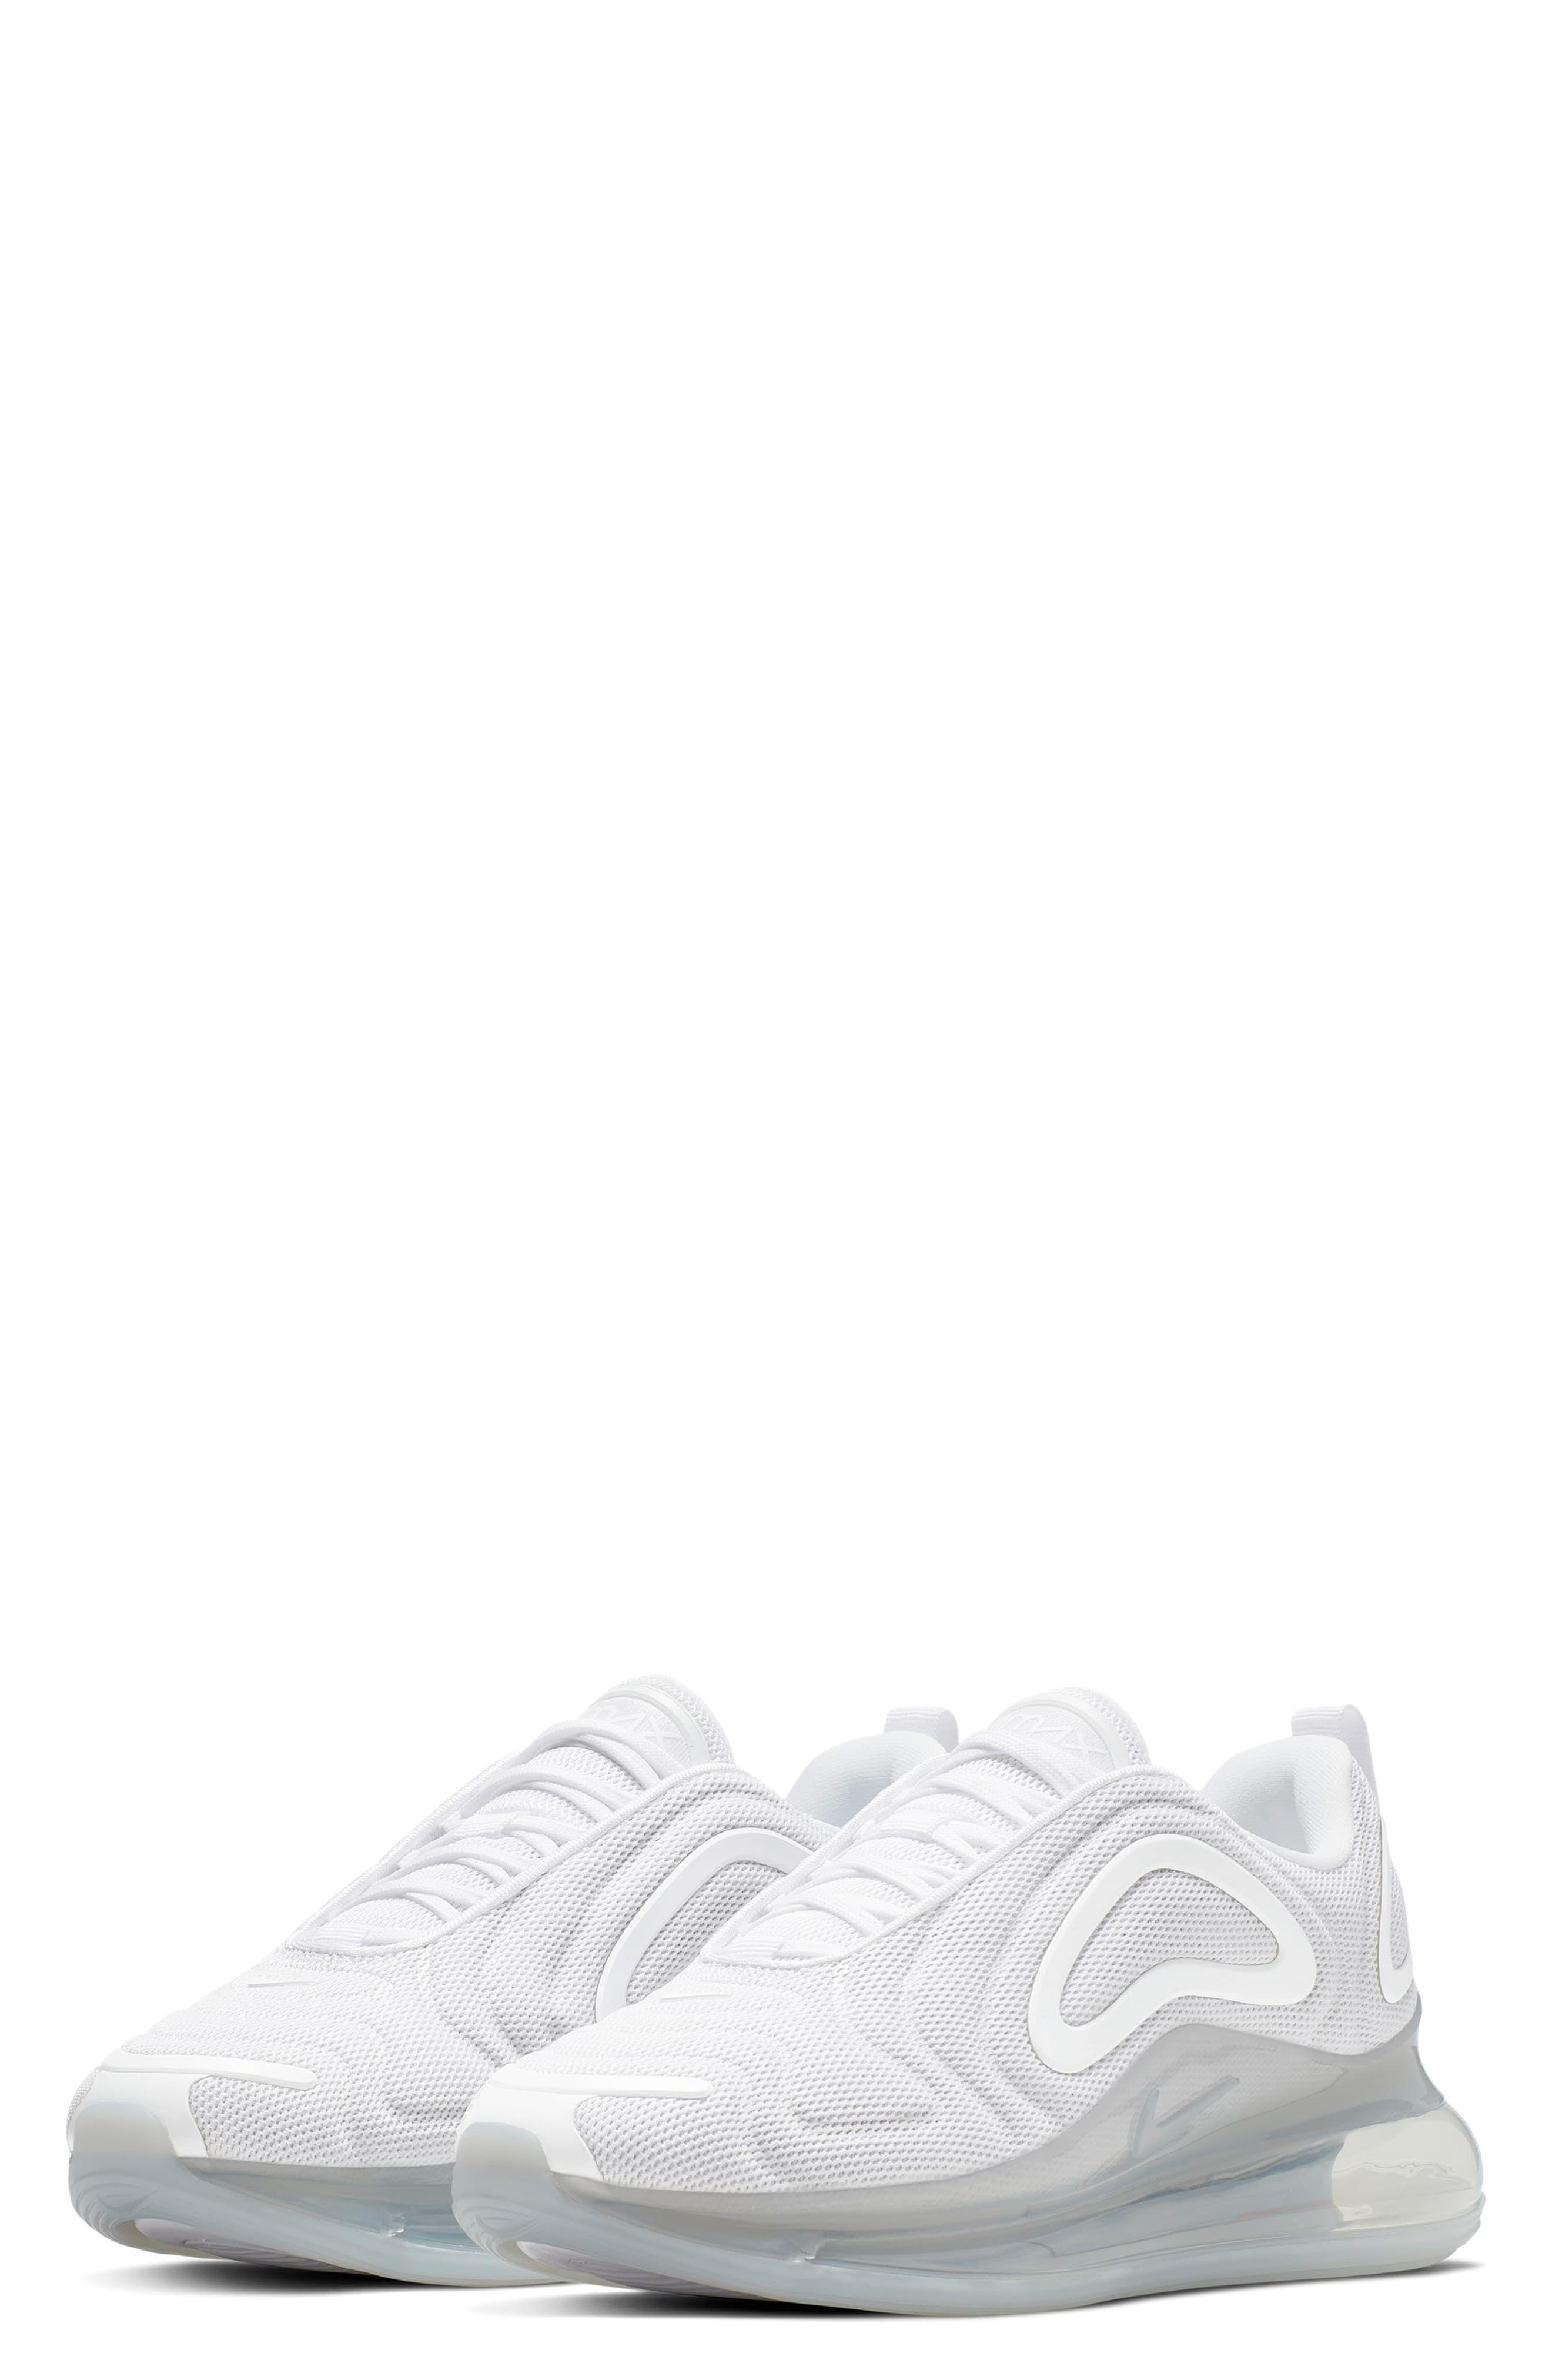 Nike Air Max 720 Sneaker (Women   Nike air max, Nike air max